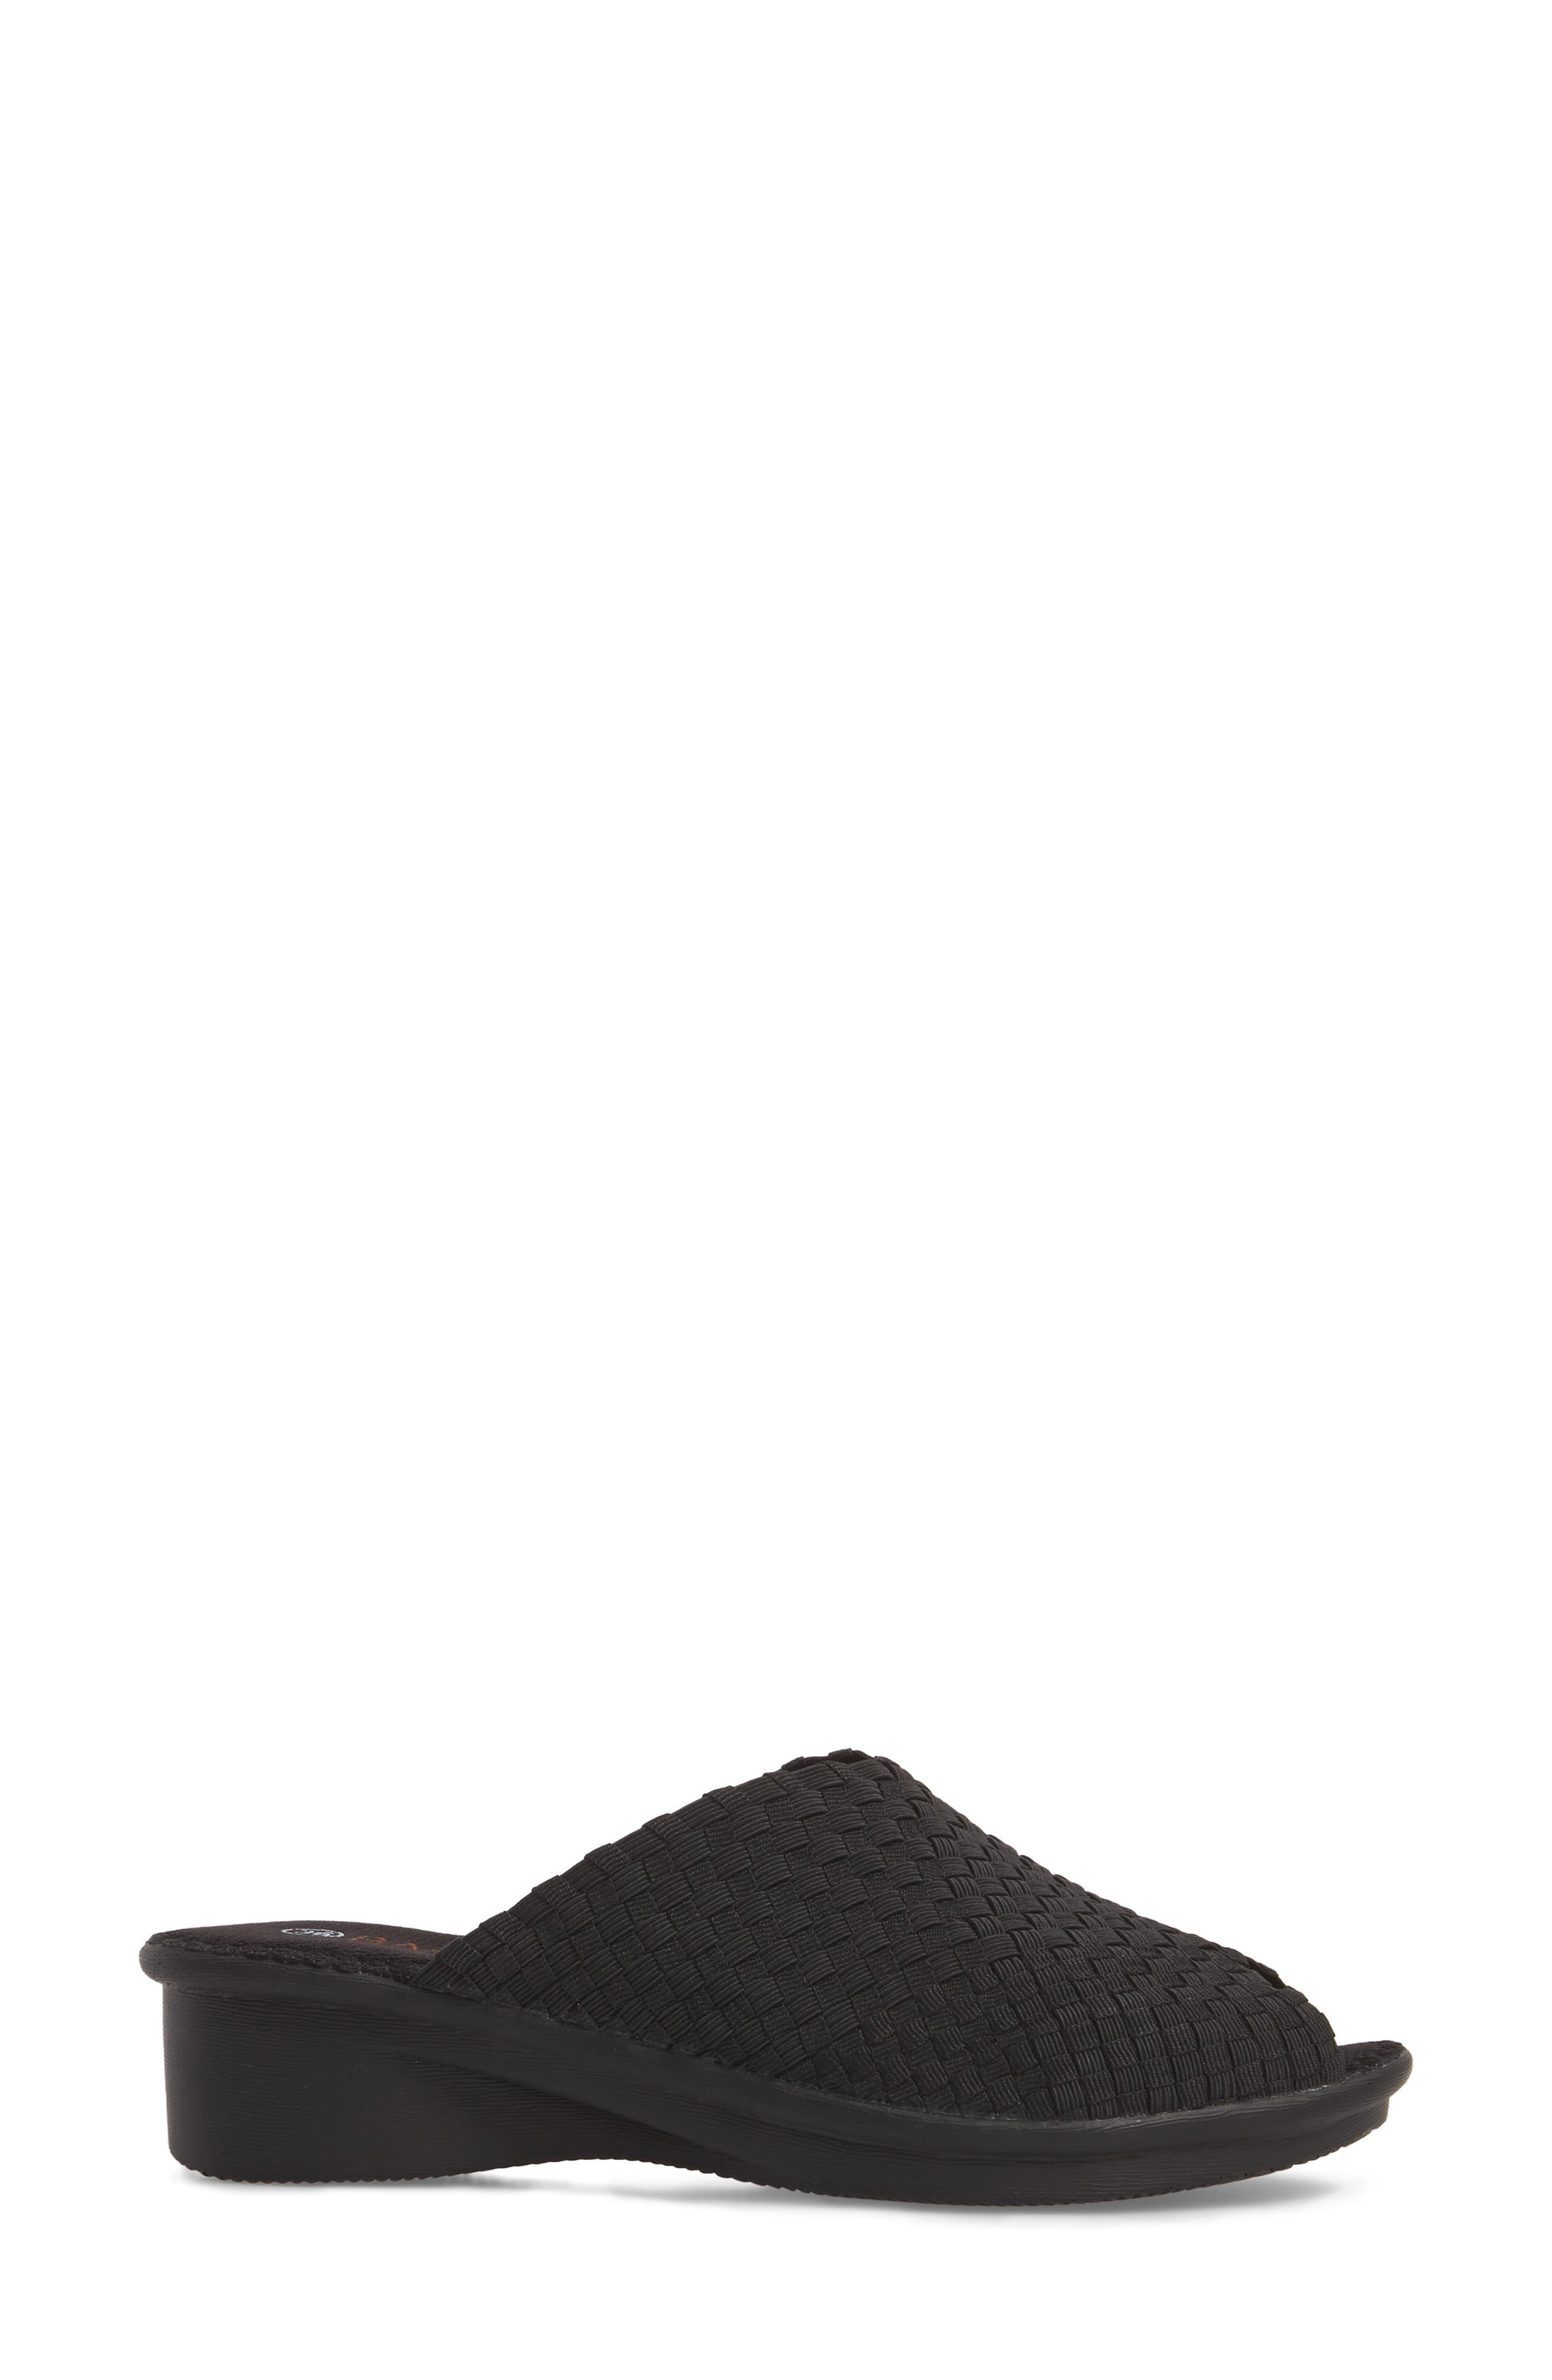 Cyrene Wedge Sandal,                             Alternate thumbnail 3, color,                             BLACK FABRIC